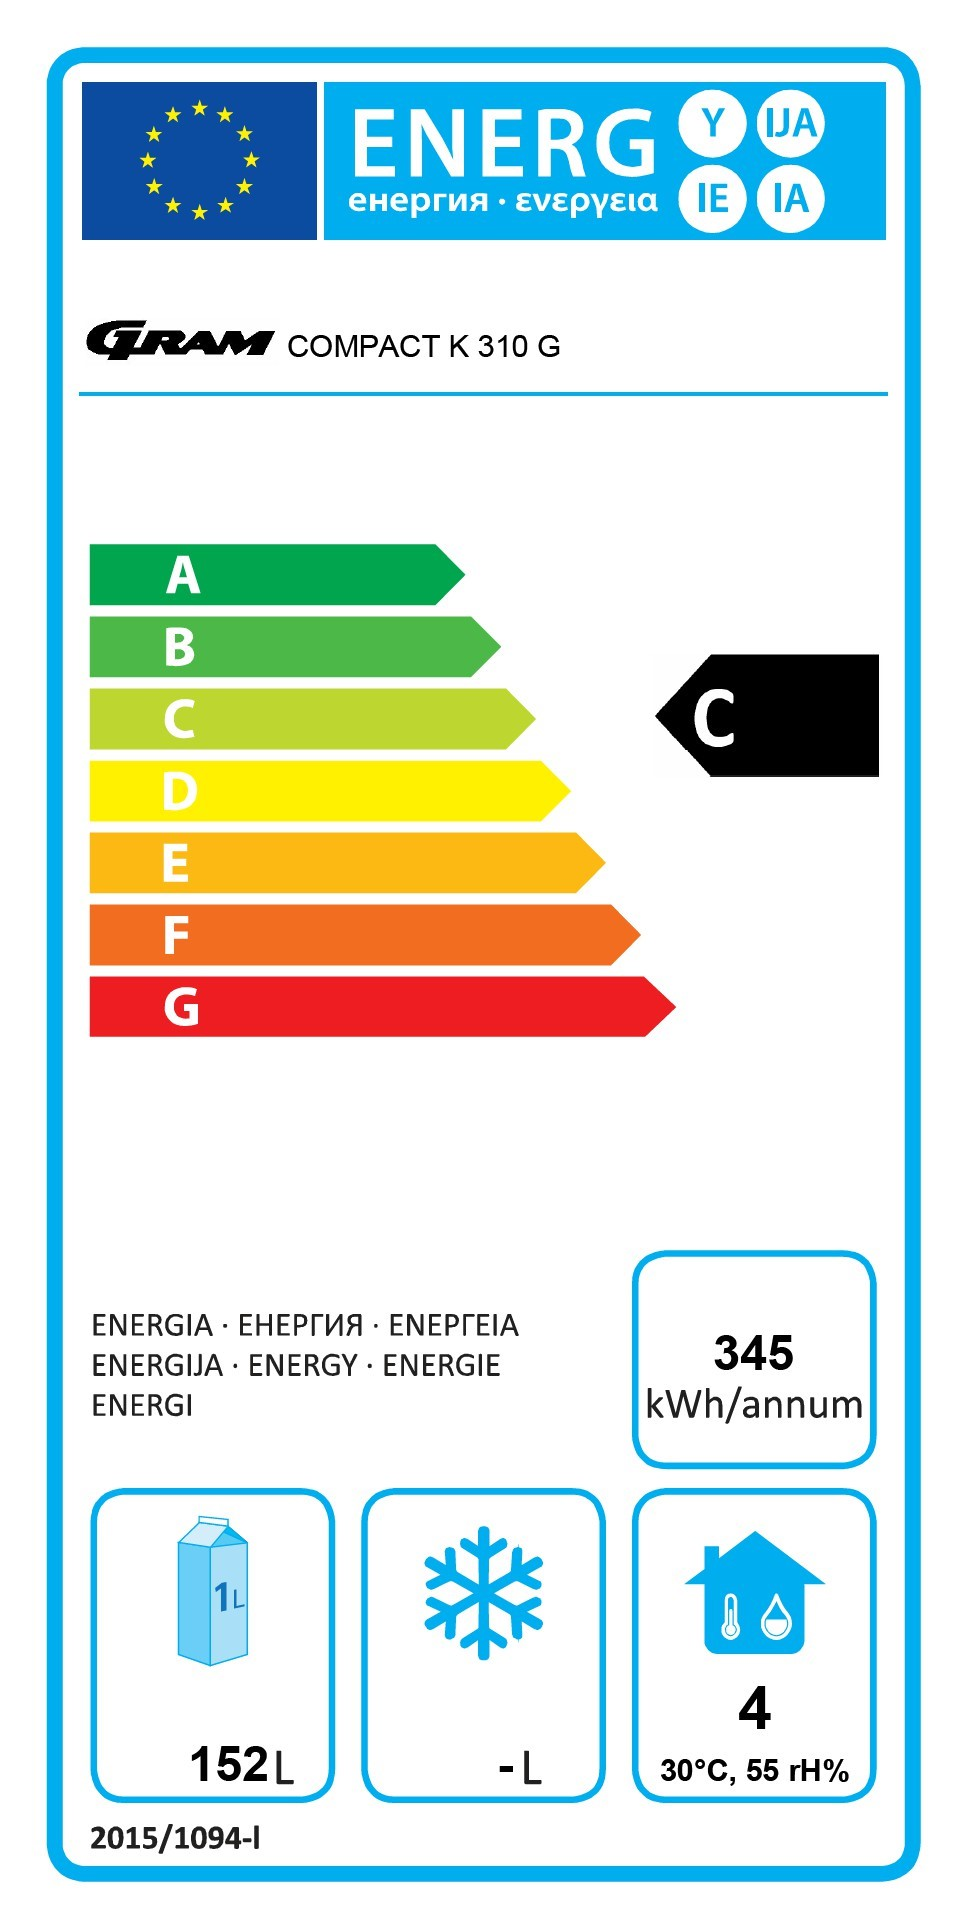 COMPACT K 310 LG C 4W 218 Ltr Single Door Upright Fridge Energy Rating